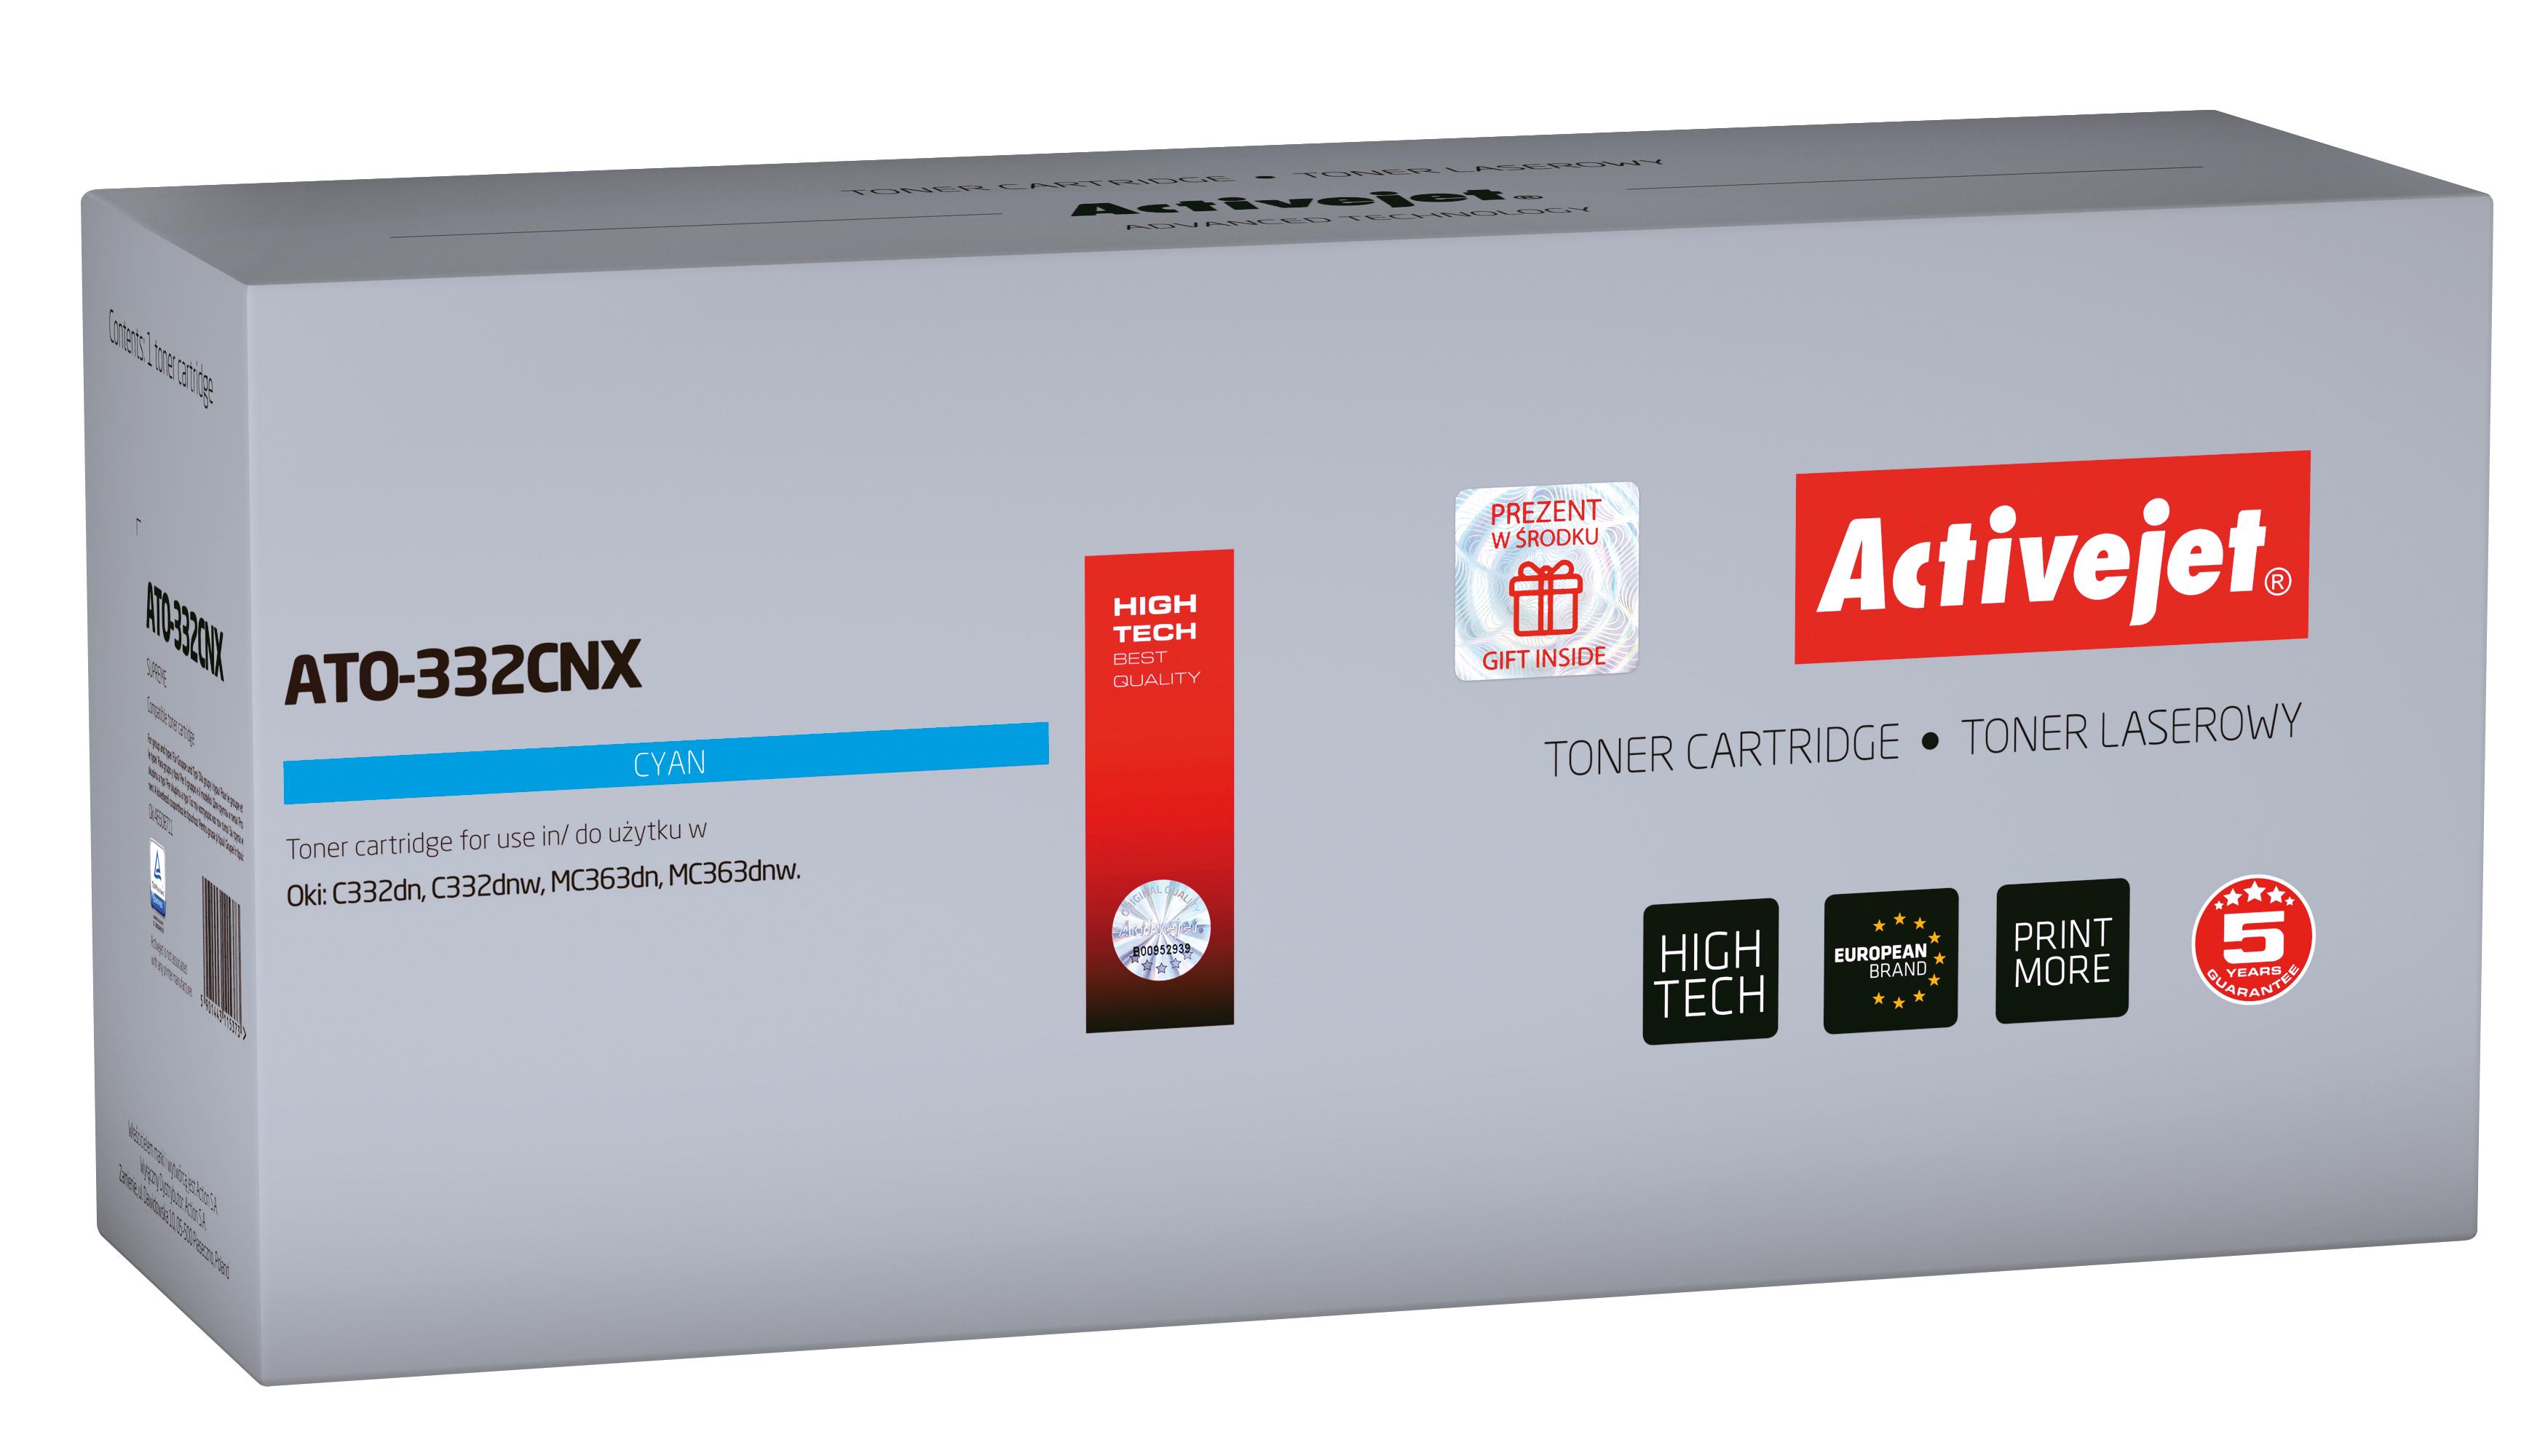 Toner Activejet  ATO-332CNX do drukarki OKI, Zamiennik OKI 46508711; Supreme; 3000 stron; Błękitny.